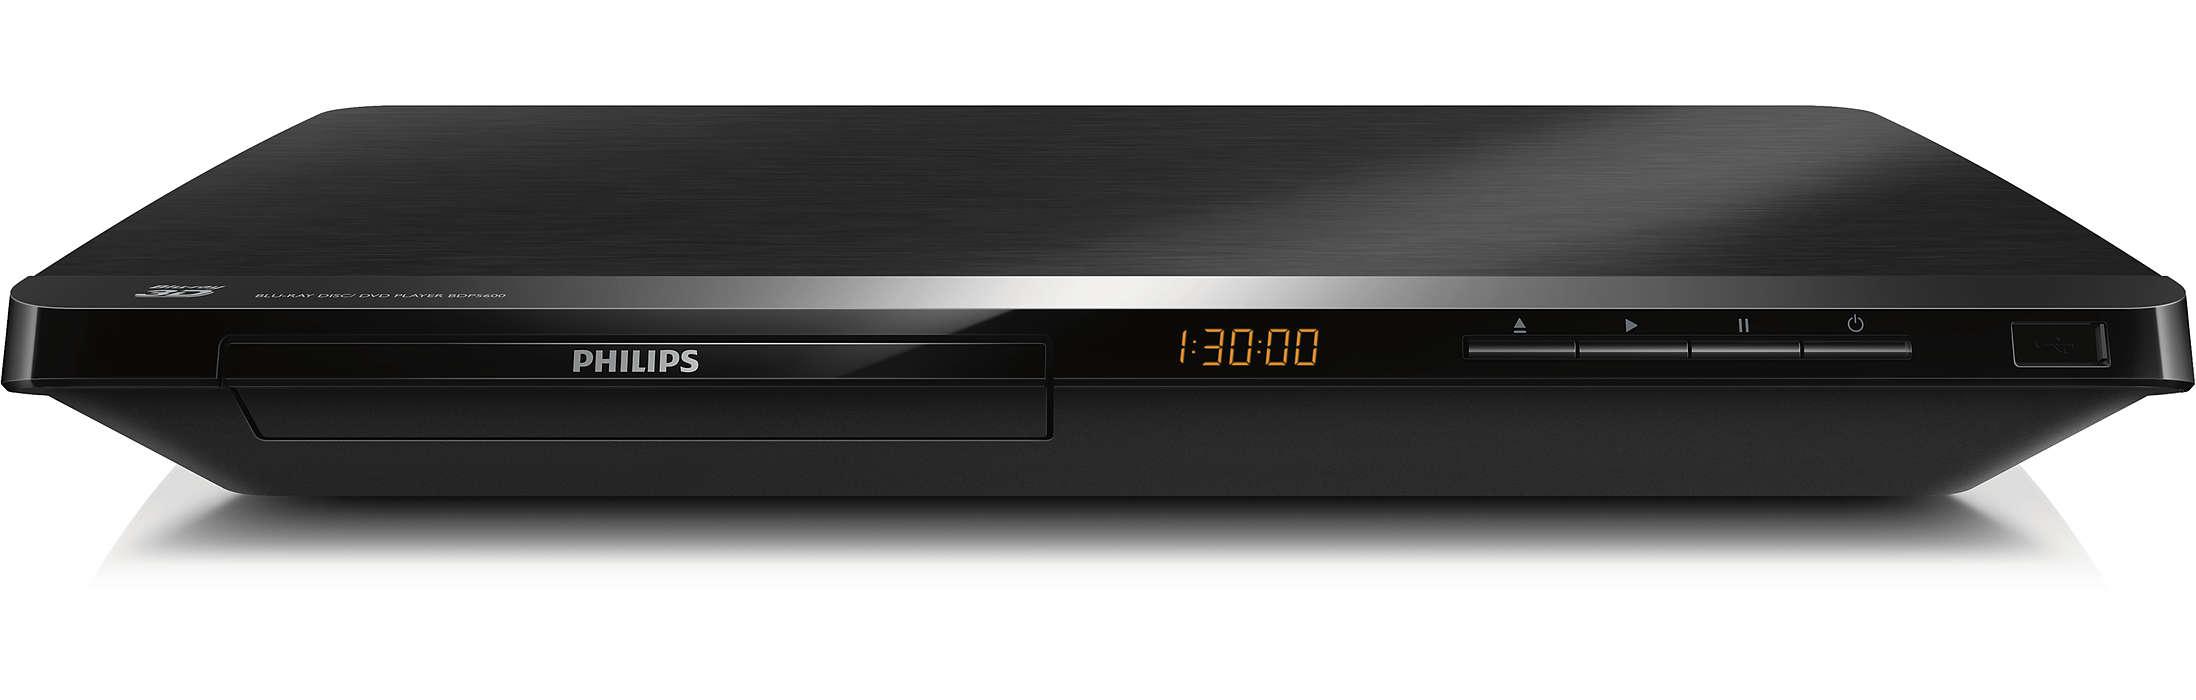 Blu-ray 3D και τα καλύτερα από το Internet στην τηλεόρασή σας